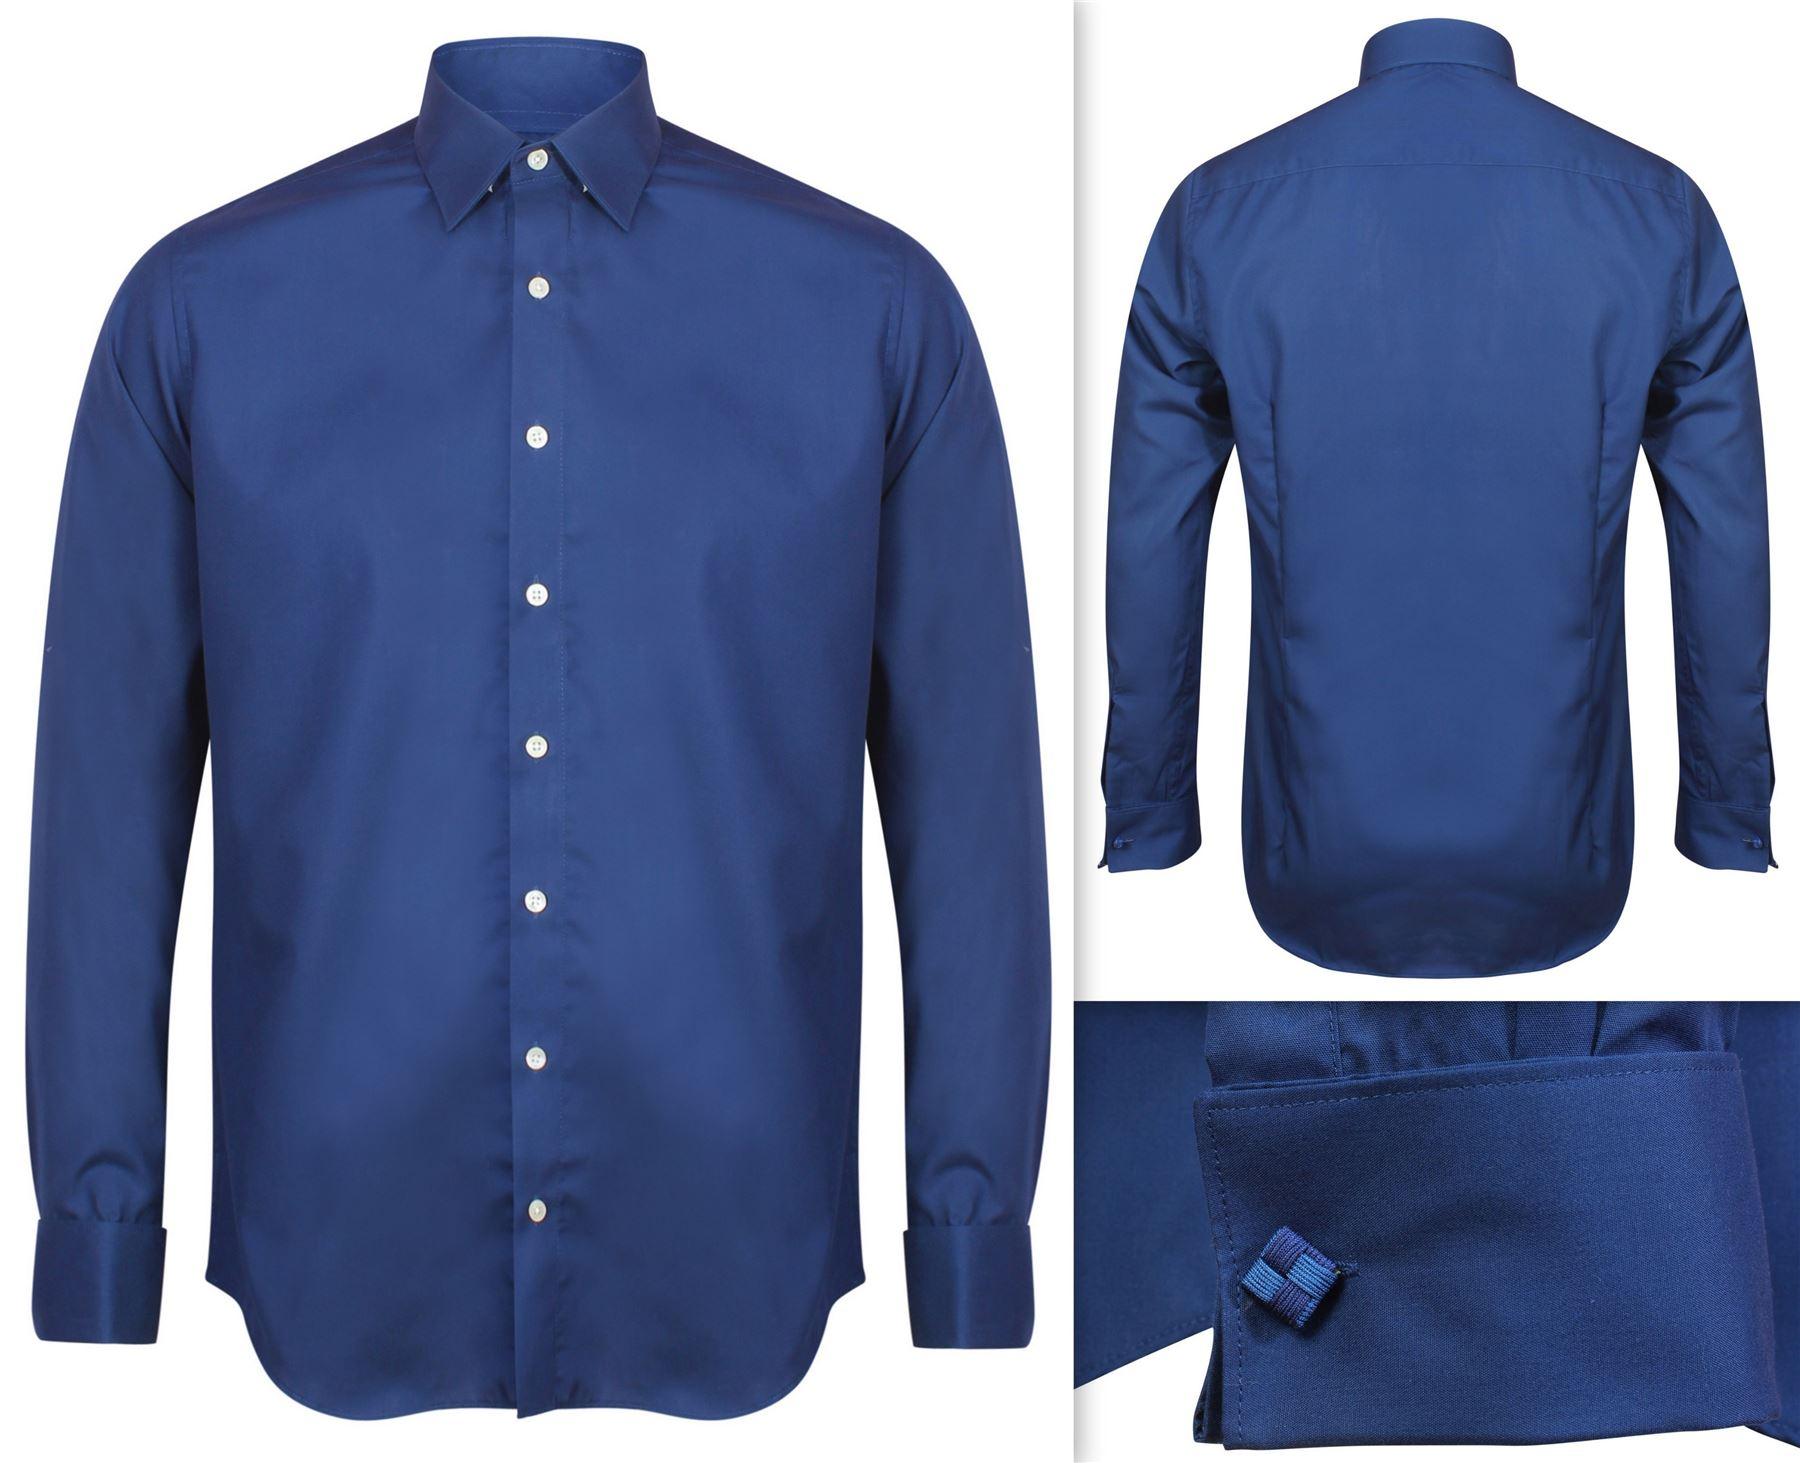 Mens Shirt Invictus Slim Athletic Body Fit Easycare Cotton